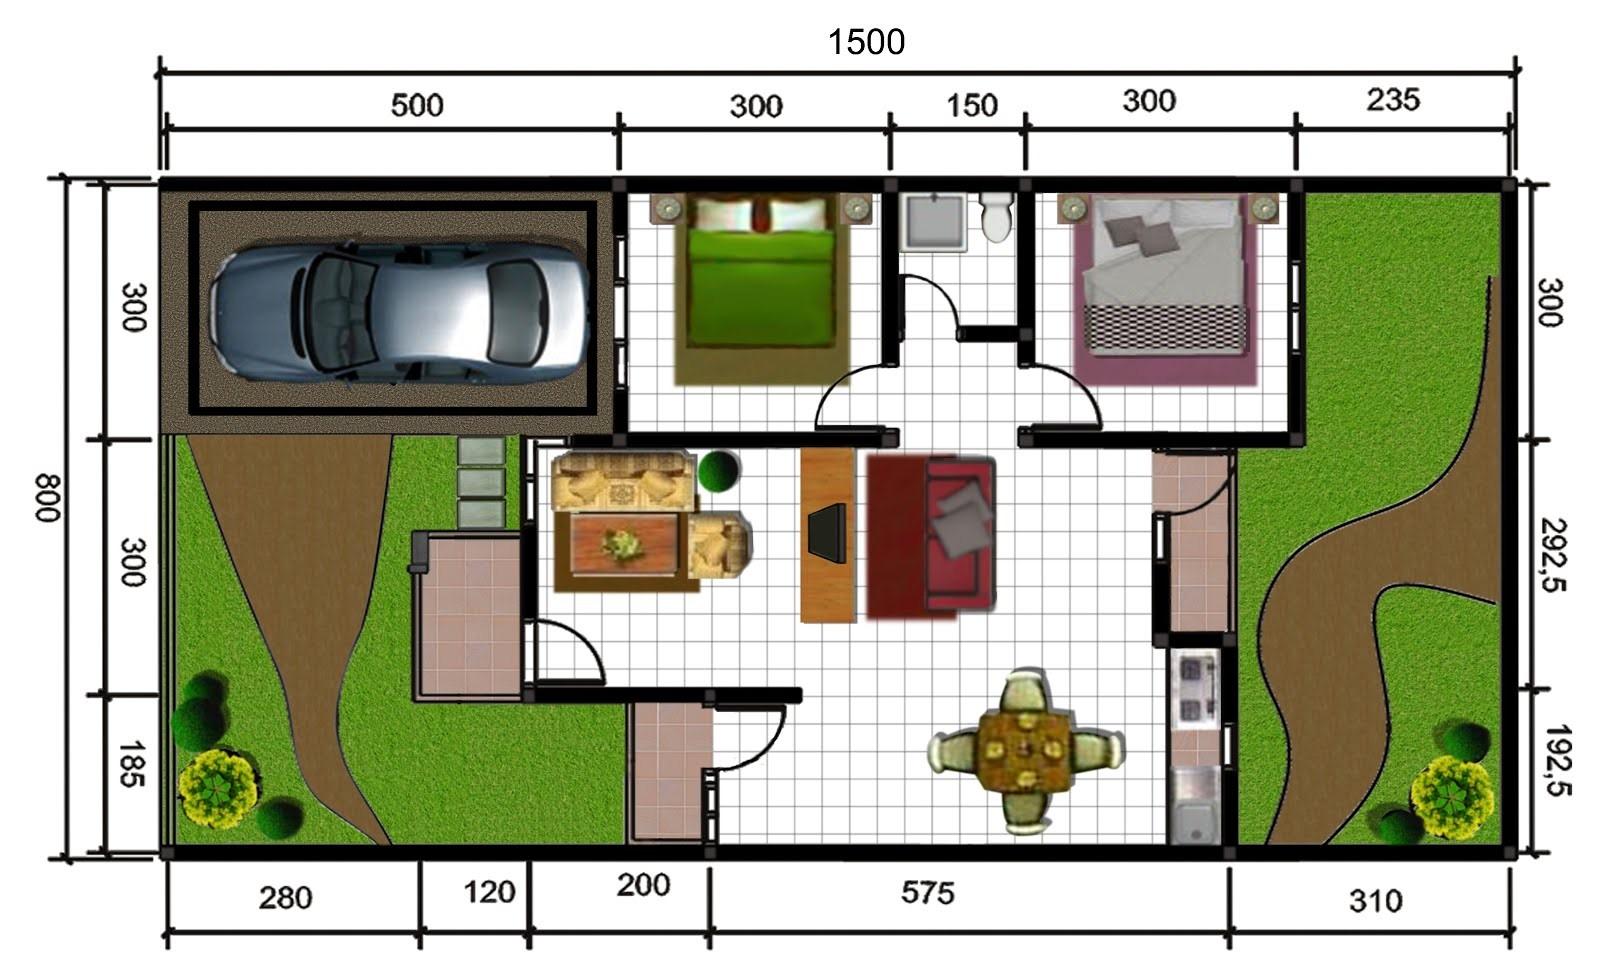 gambar denah rumah dan ukuran keterangan 2